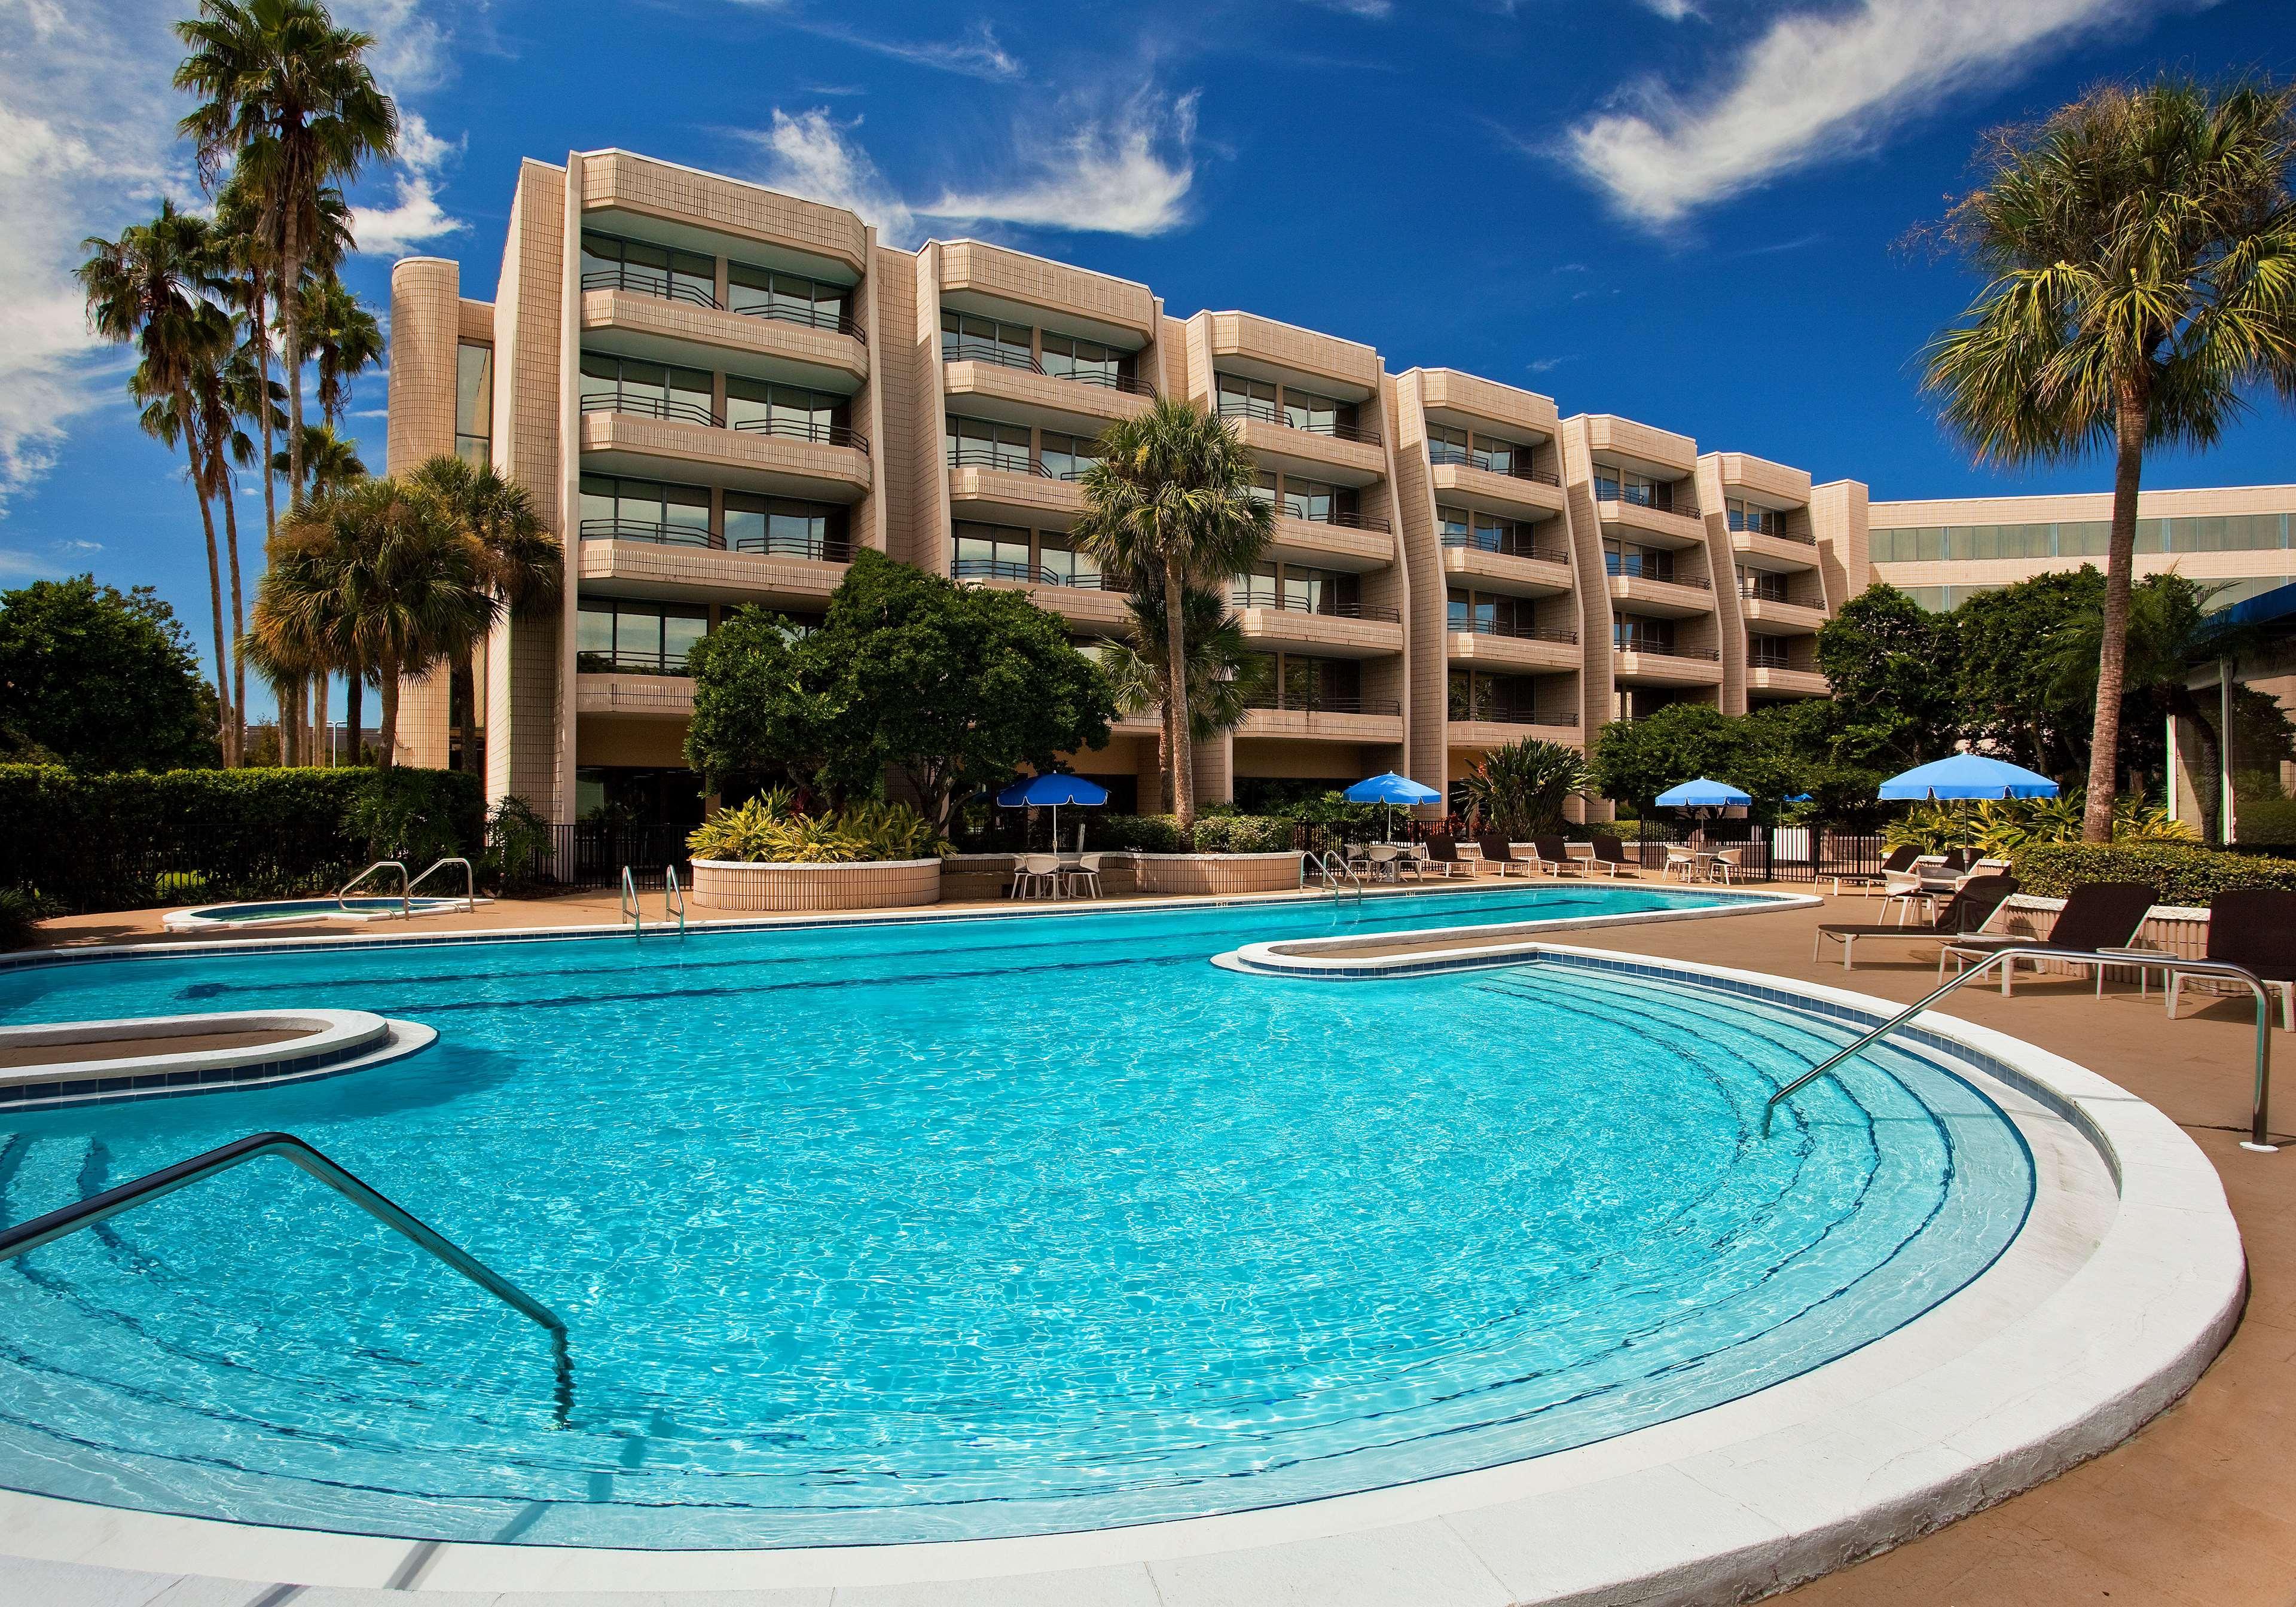 Sheraton Tampa Brandon Hotel image 7